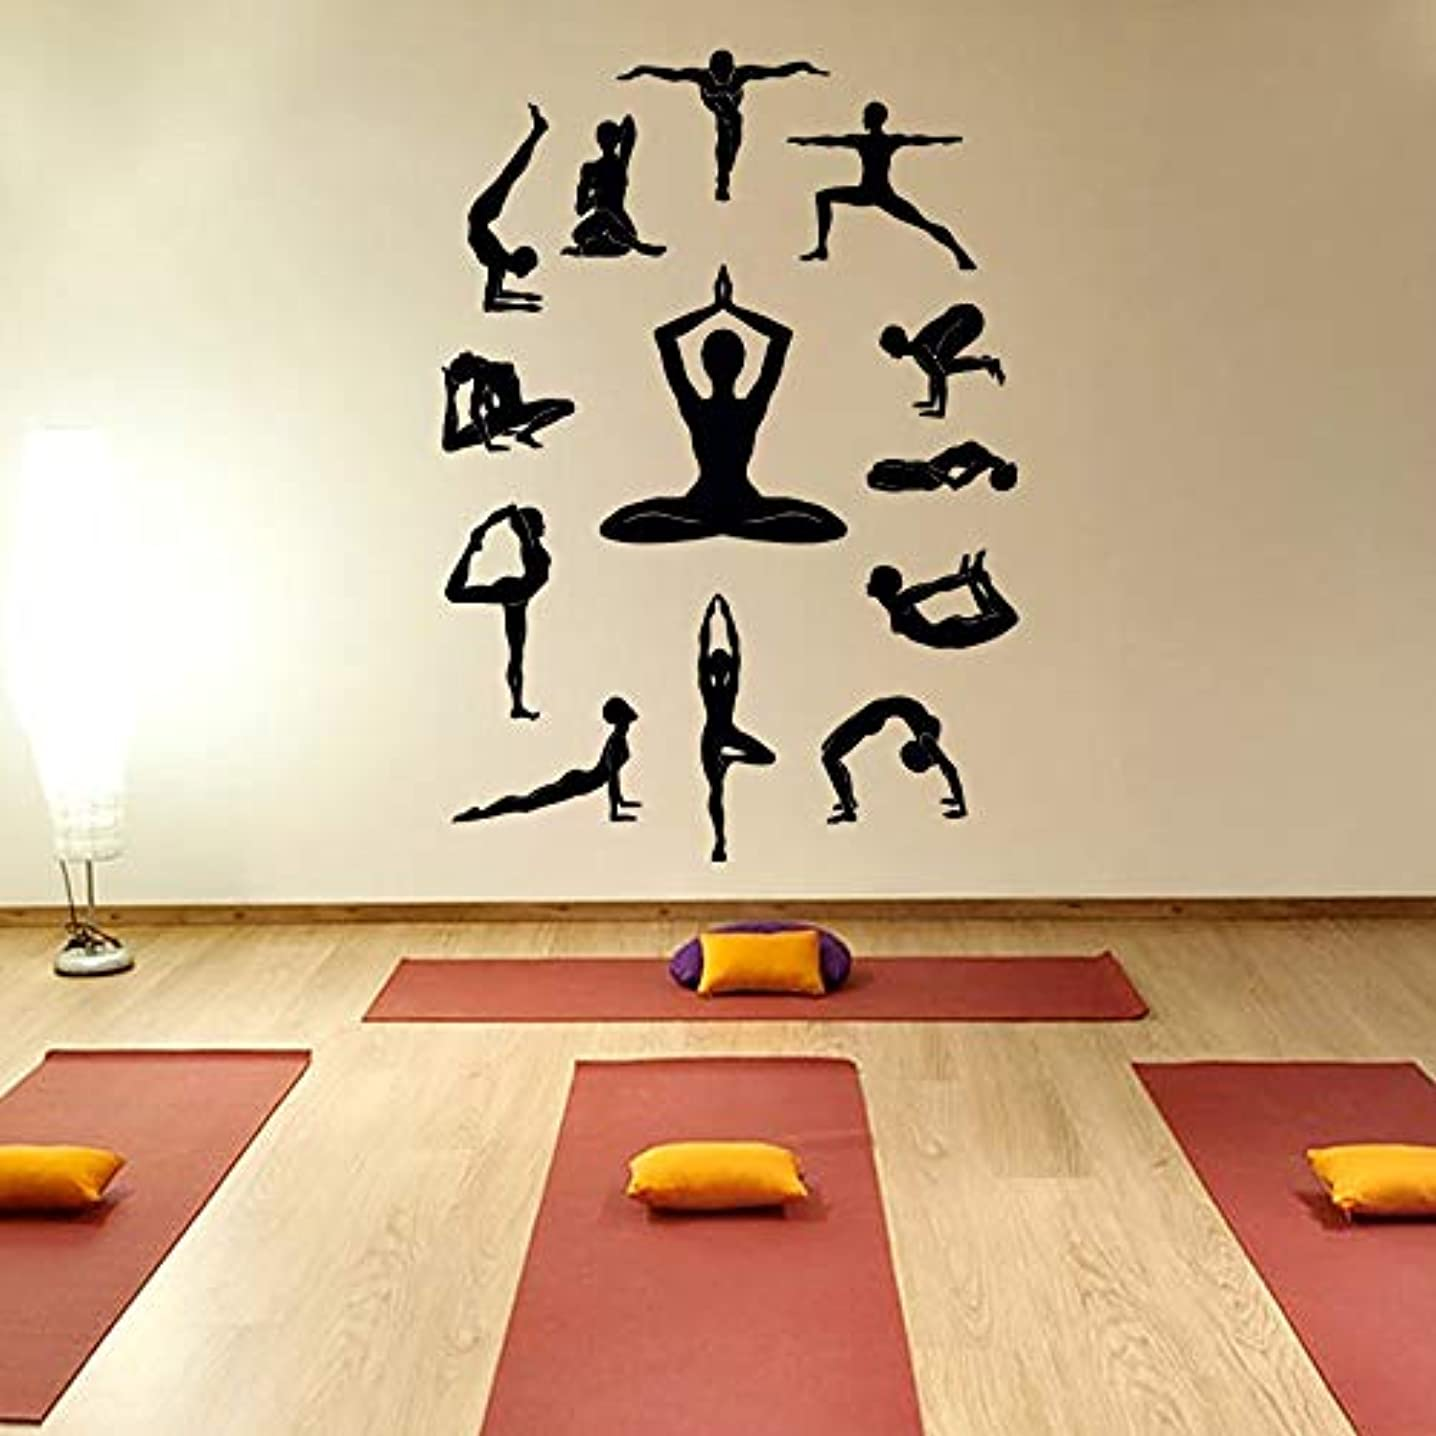 Yoga Wall Decal Vinyl Sticker, Yoga Studio Decor, Lotus Yoga Meditation Symbol Fitness Pilates Sports Wall Decals Wall Art Home Decor Z890